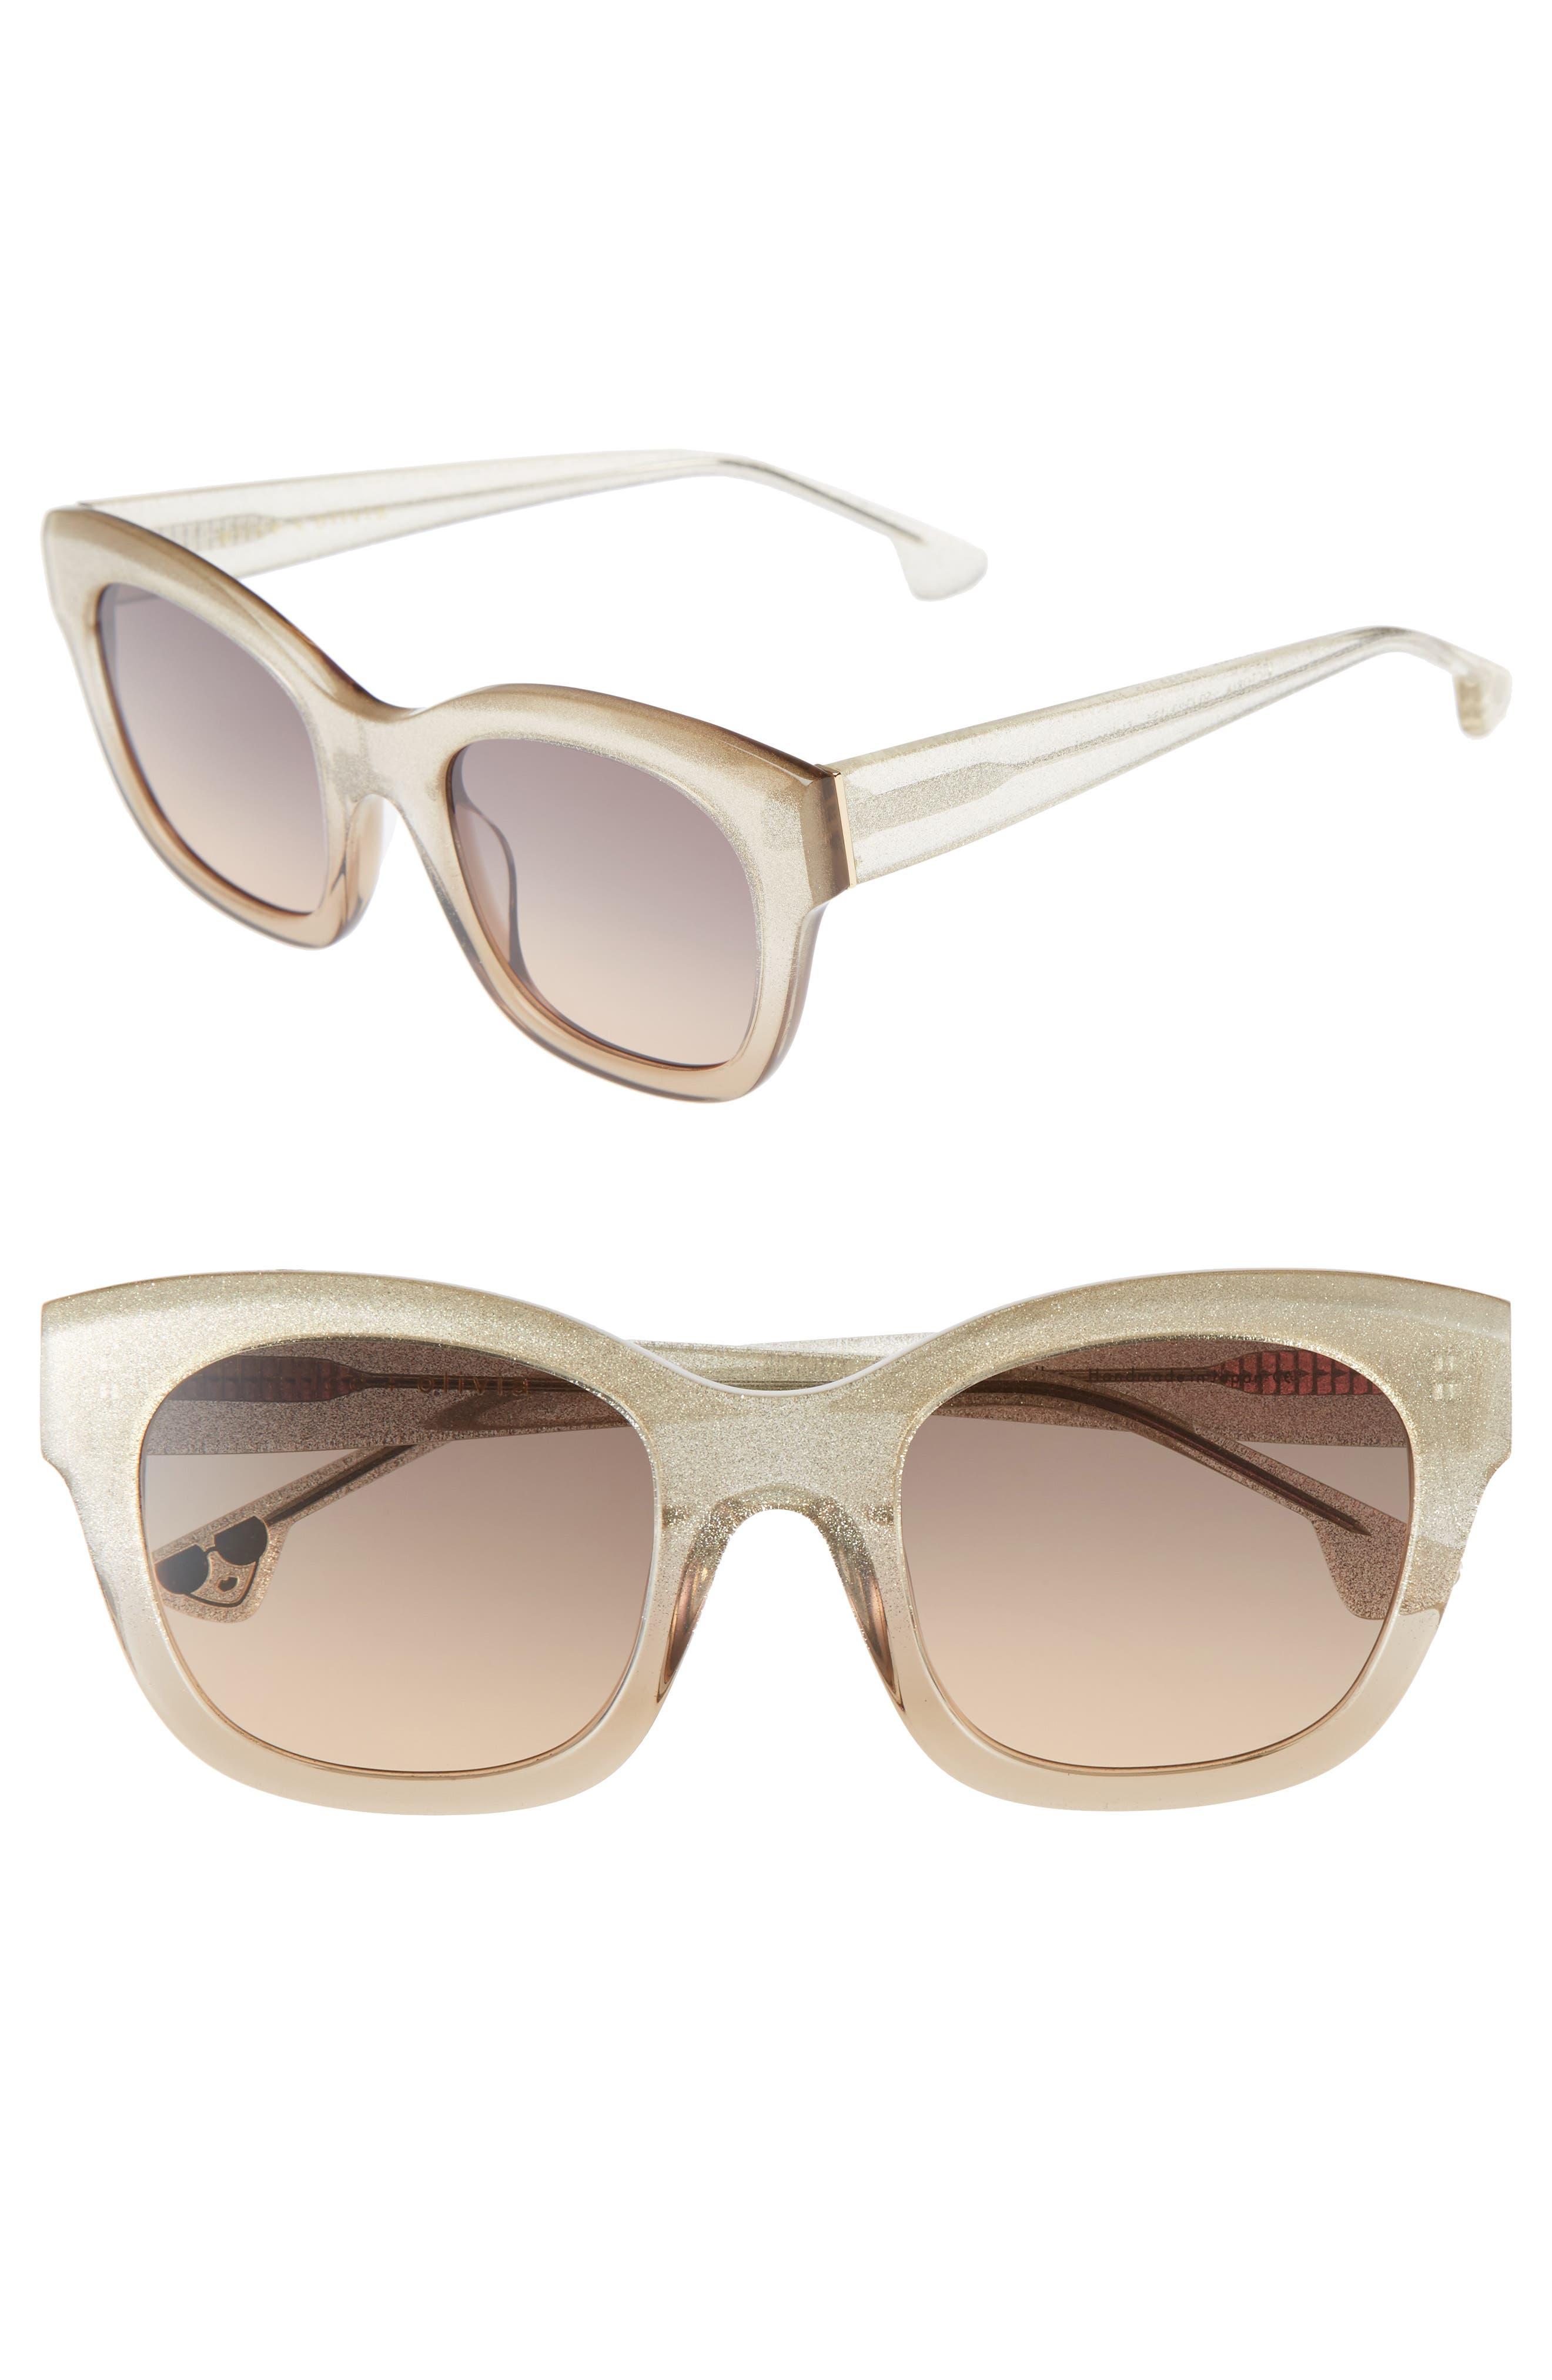 Alternate Image 1 Selected - Alice + Olivia Victoria 50mm Cat Eye Sunglasses